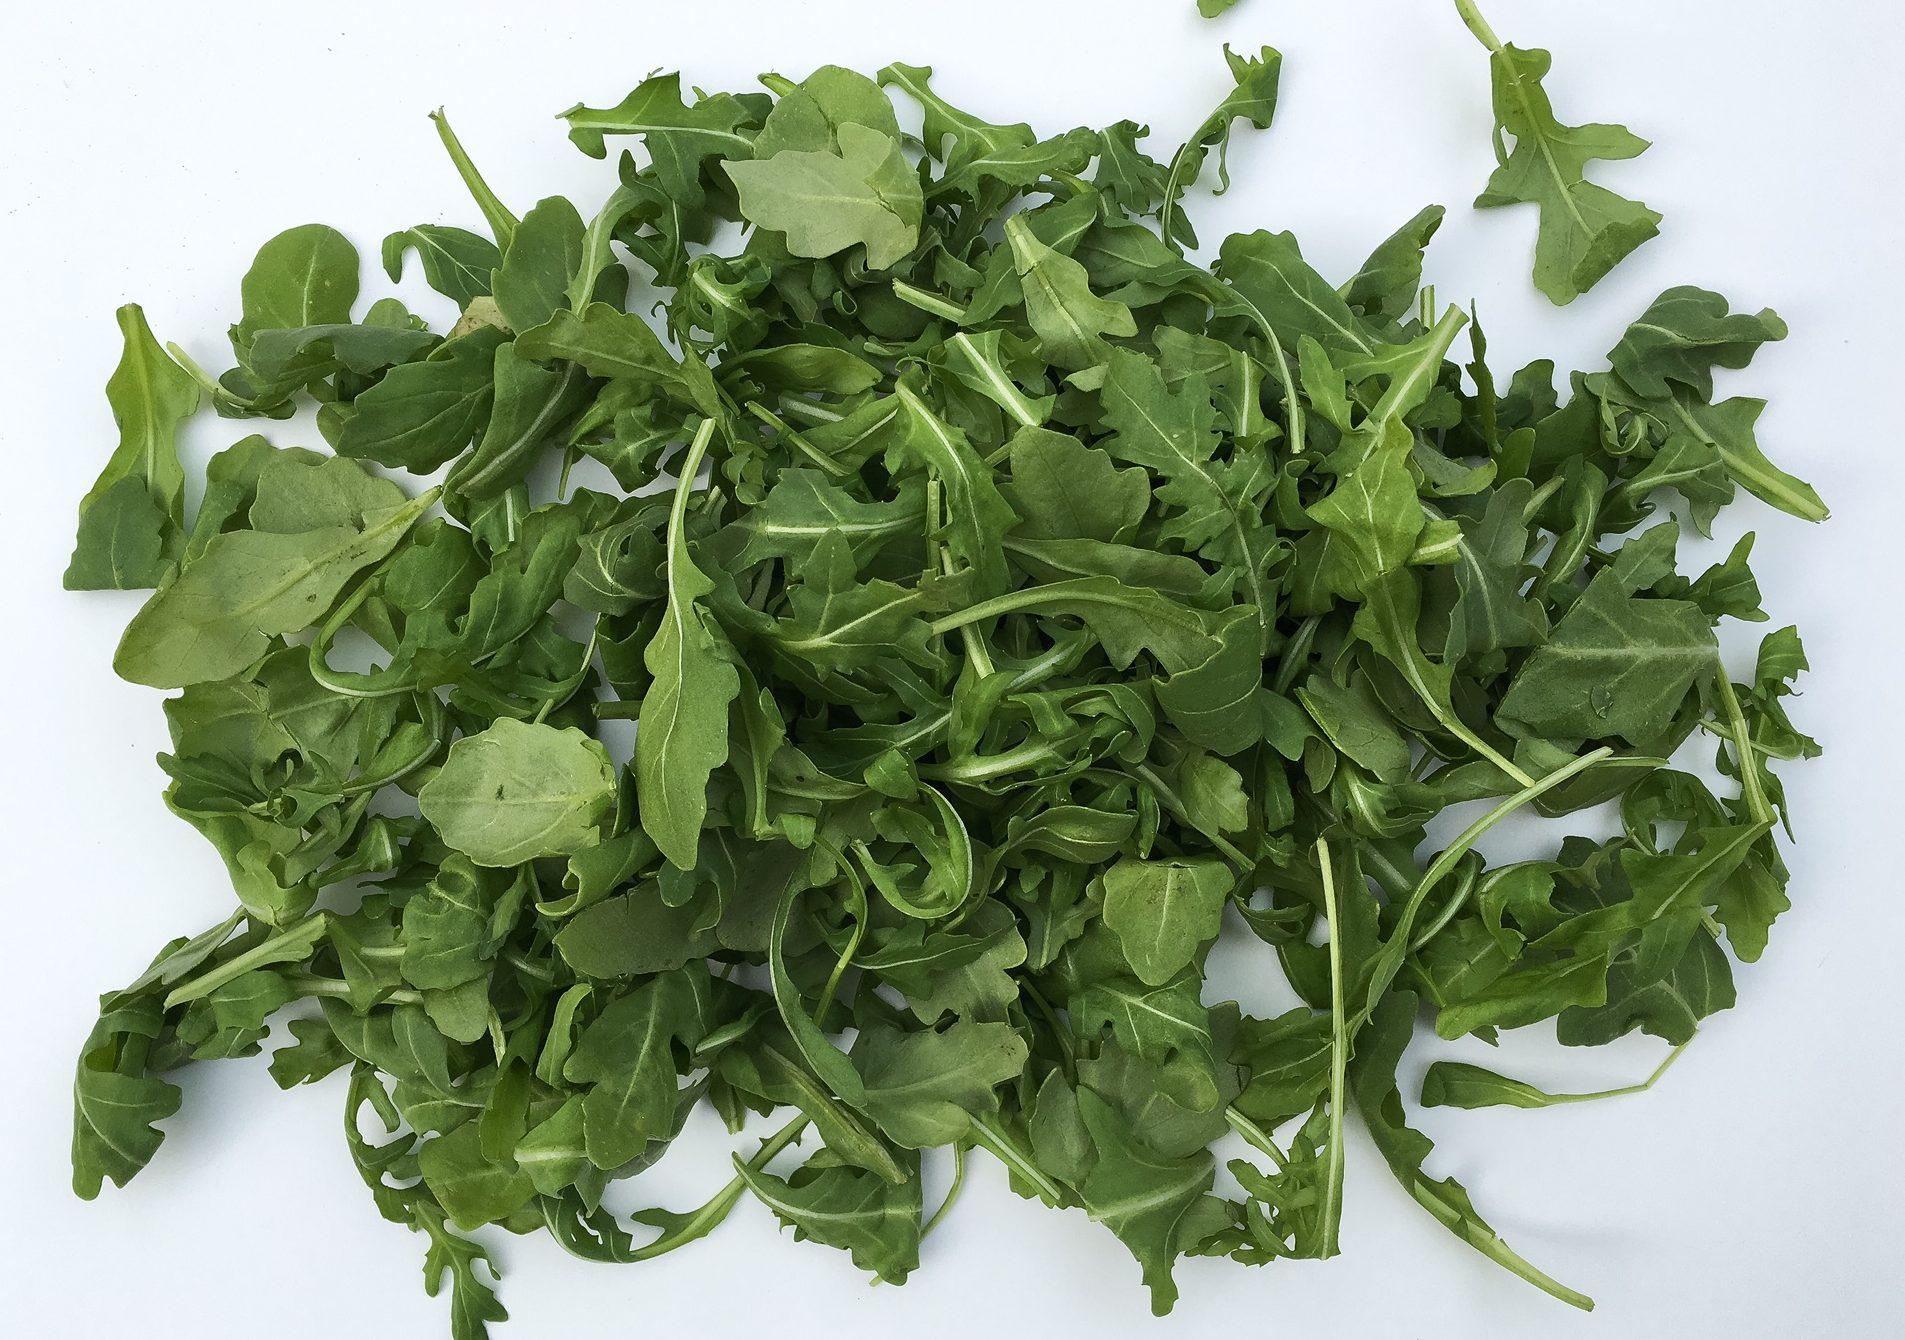 arugula, arugula salad, lettuce, salad, fall, fall salad, butternut squash, rice, cashews